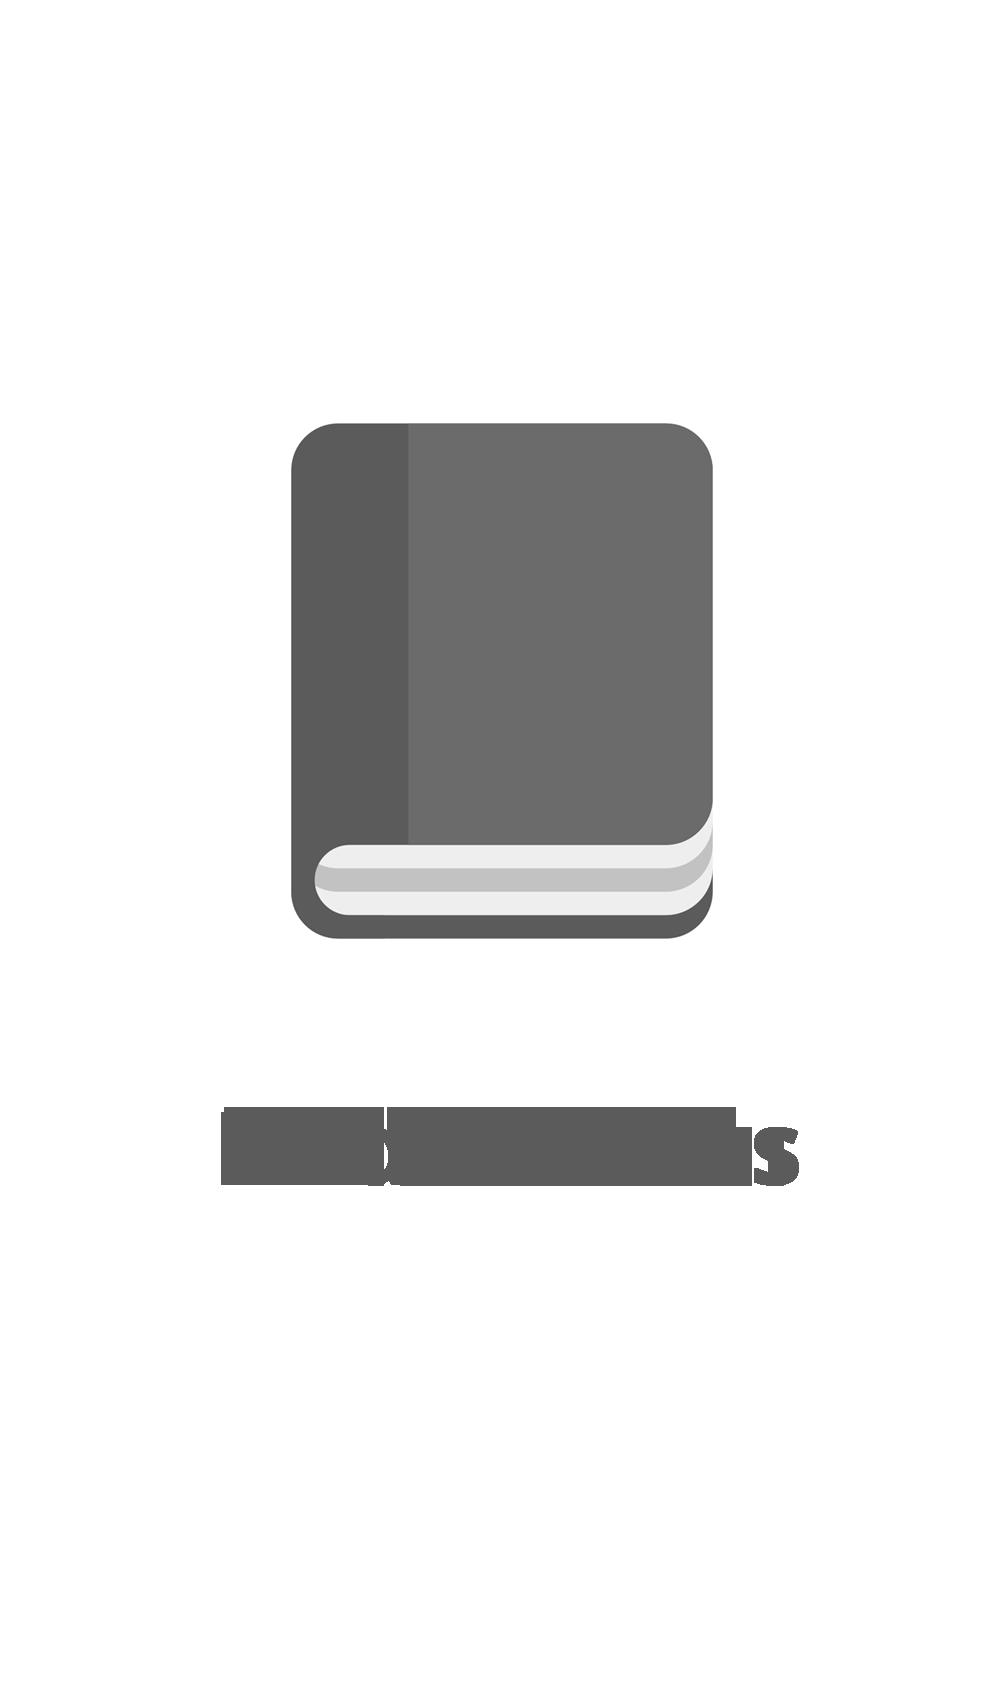 Minisexguide-låda (4x4 böcker)